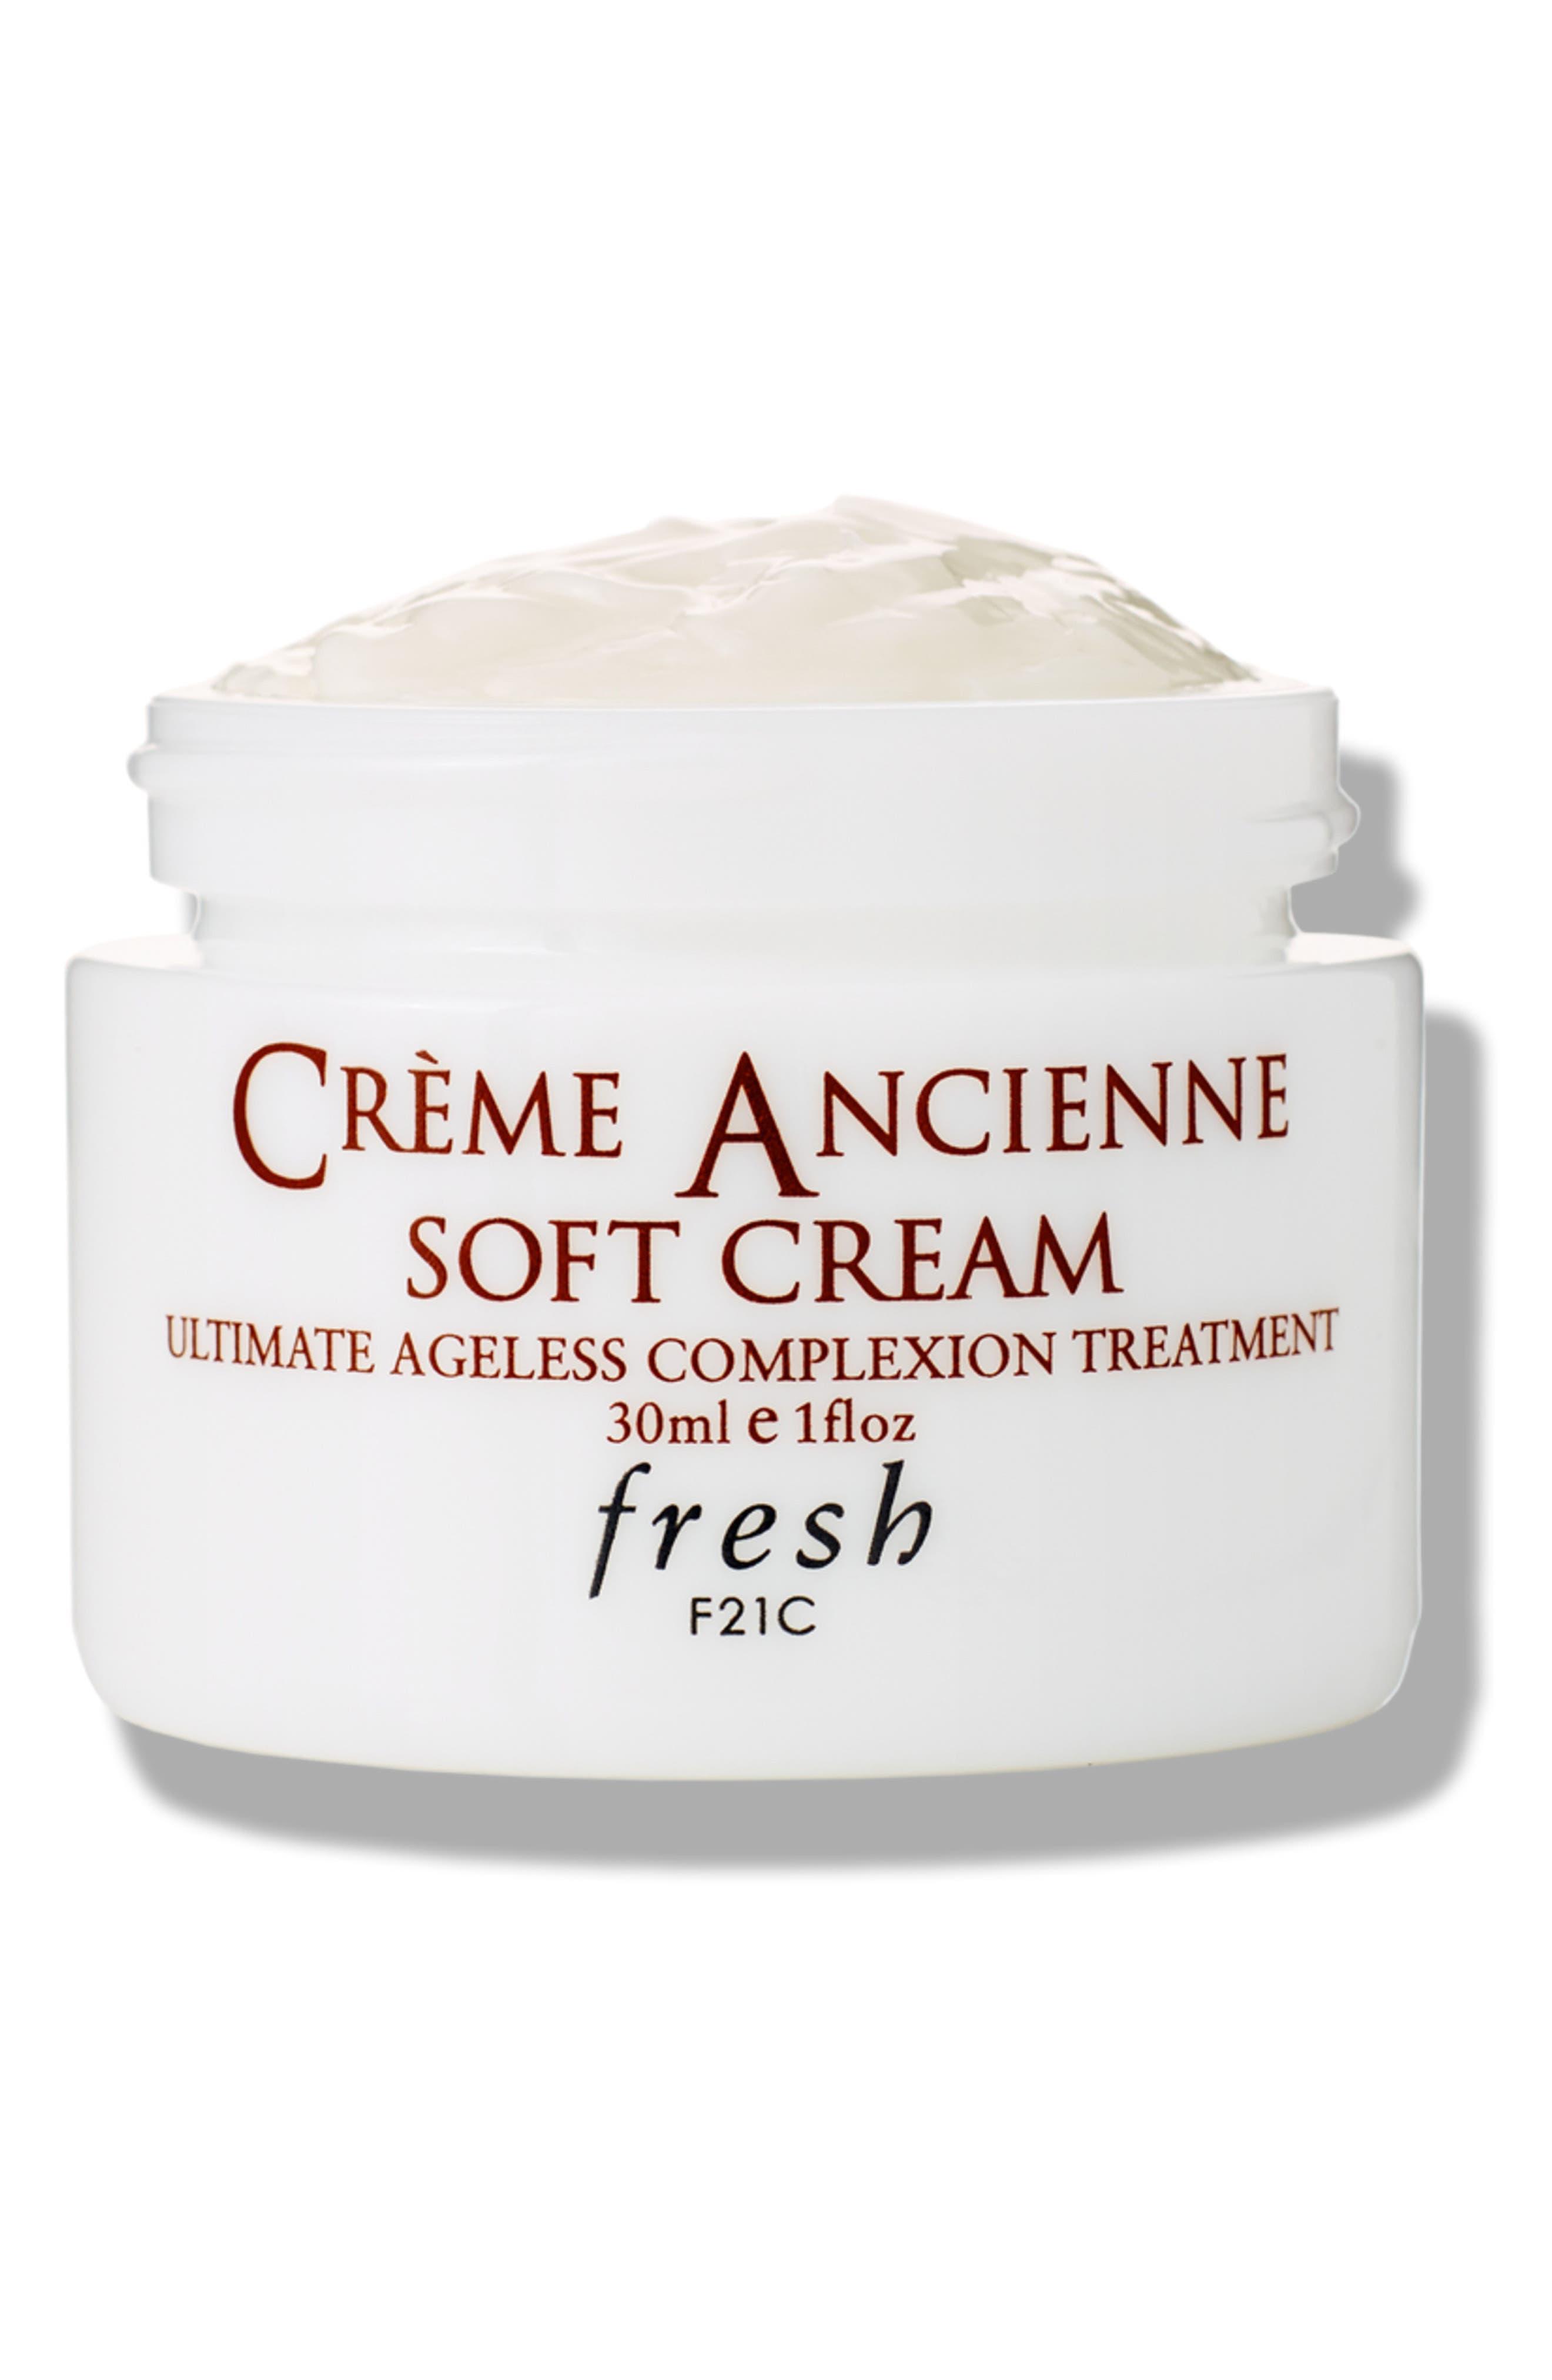 Crème Ancienne Soft Cream   Nordstrom